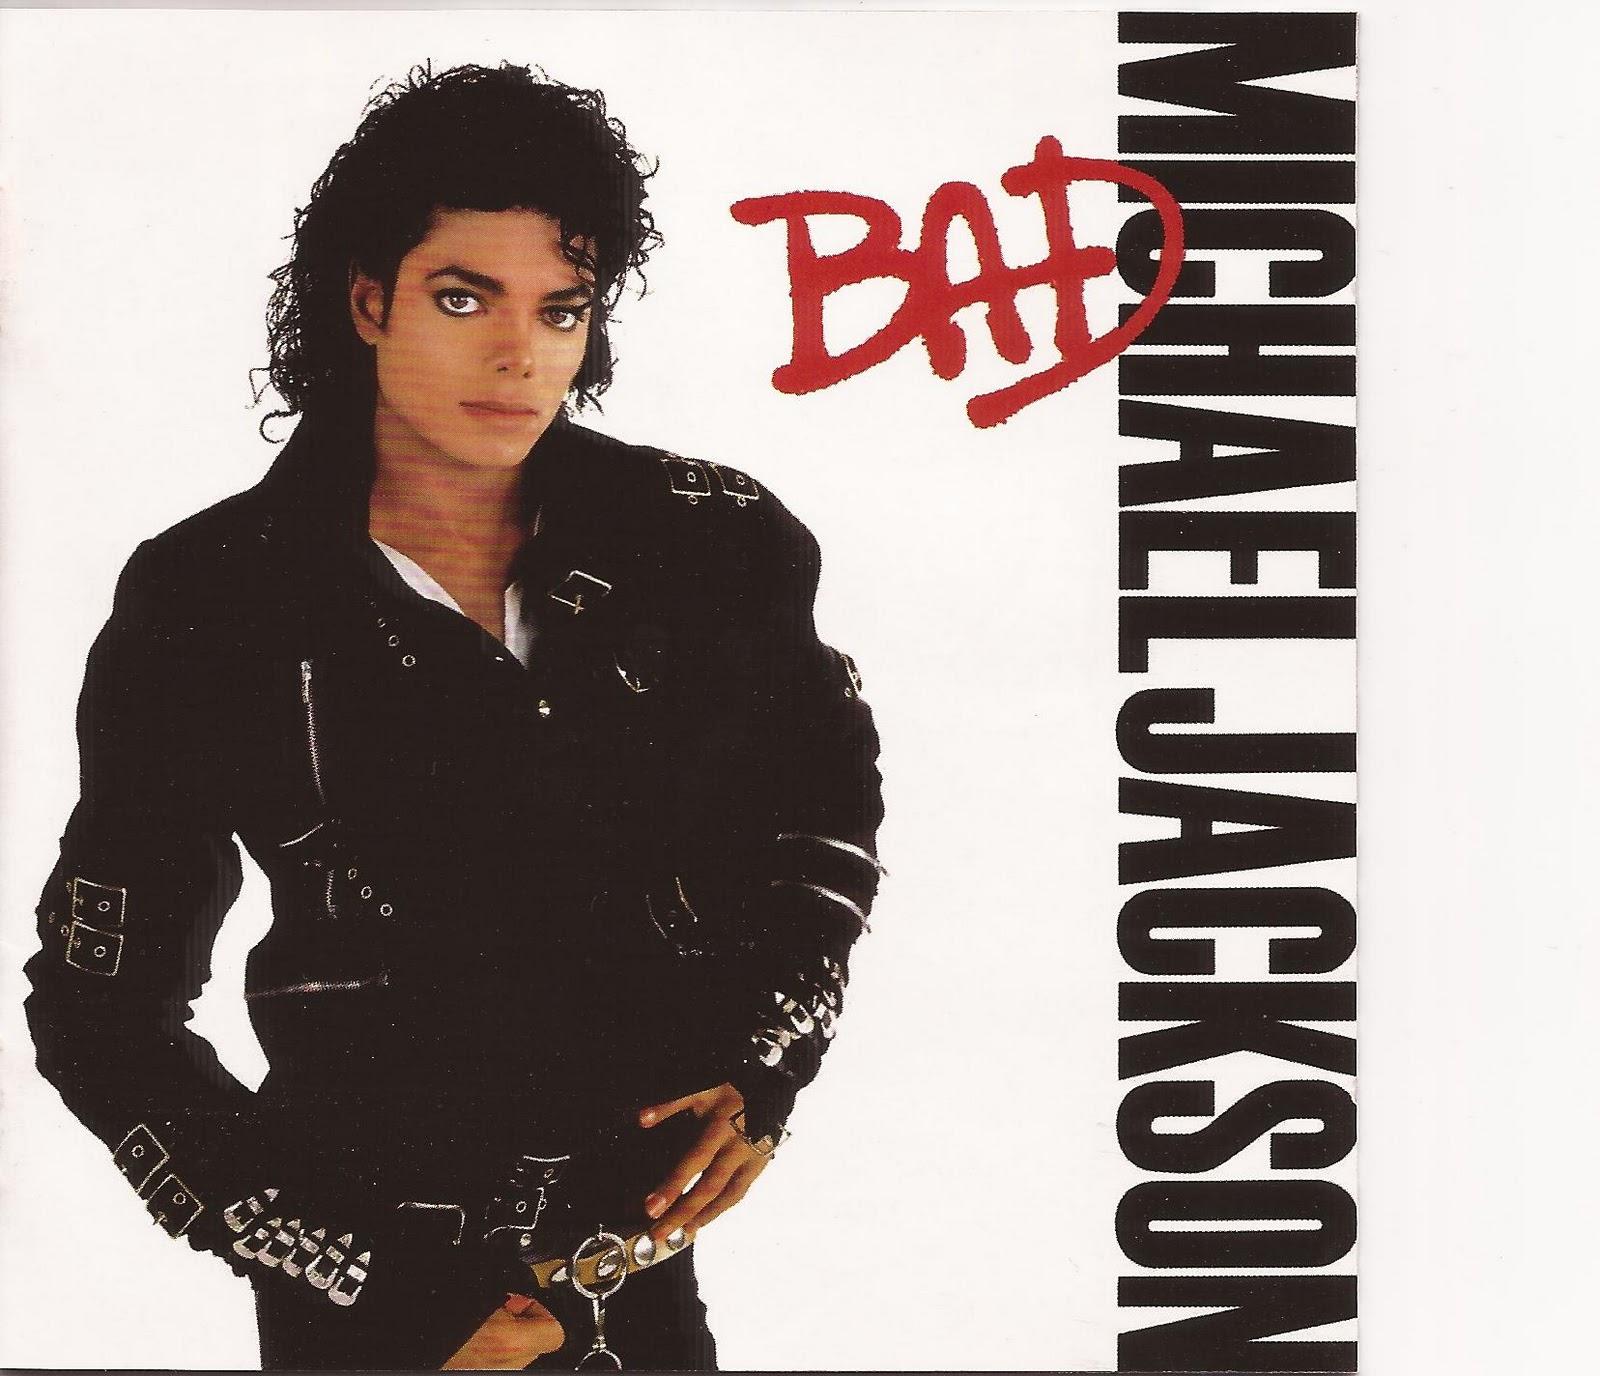 http://4.bp.blogspot.com/-dDGTW40tByE/TqYz7Ly1gxI/AAAAAAAAAmI/HZ1ddqNbsUw/s1600/Portada+Michael+Jackson+Bad.jpg